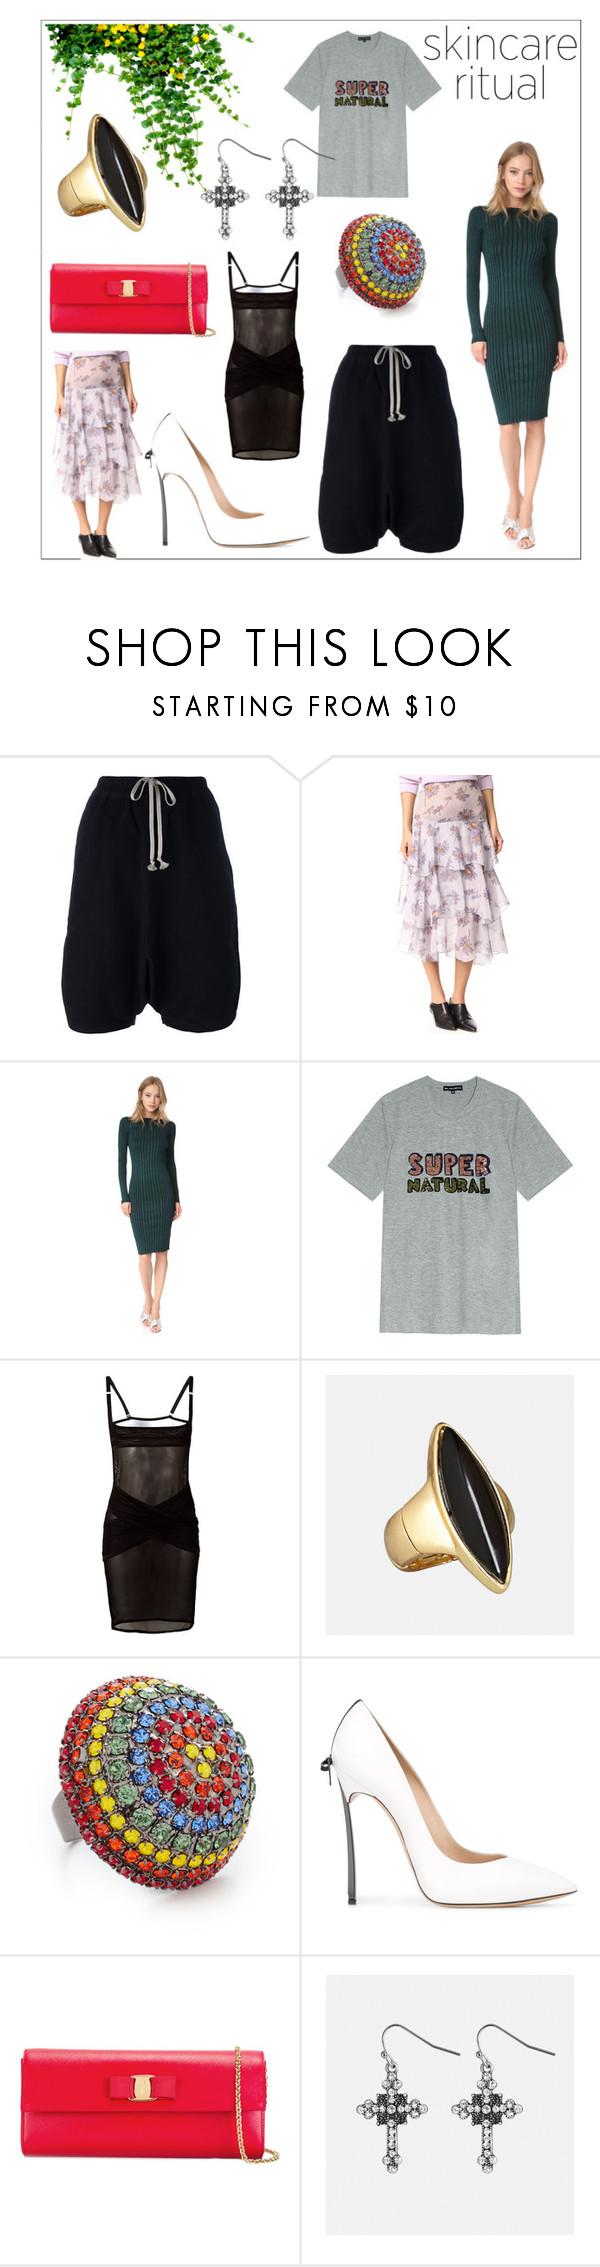 """skincare fashion"" by kristeen9 ❤ liked on Polyvore featuring DRKSHDW, Rodarte, Demylee, Markus Lupfer, Maison Close, Avenue, Elizabeth Cole, Casadei and Salvatore Ferragamo"